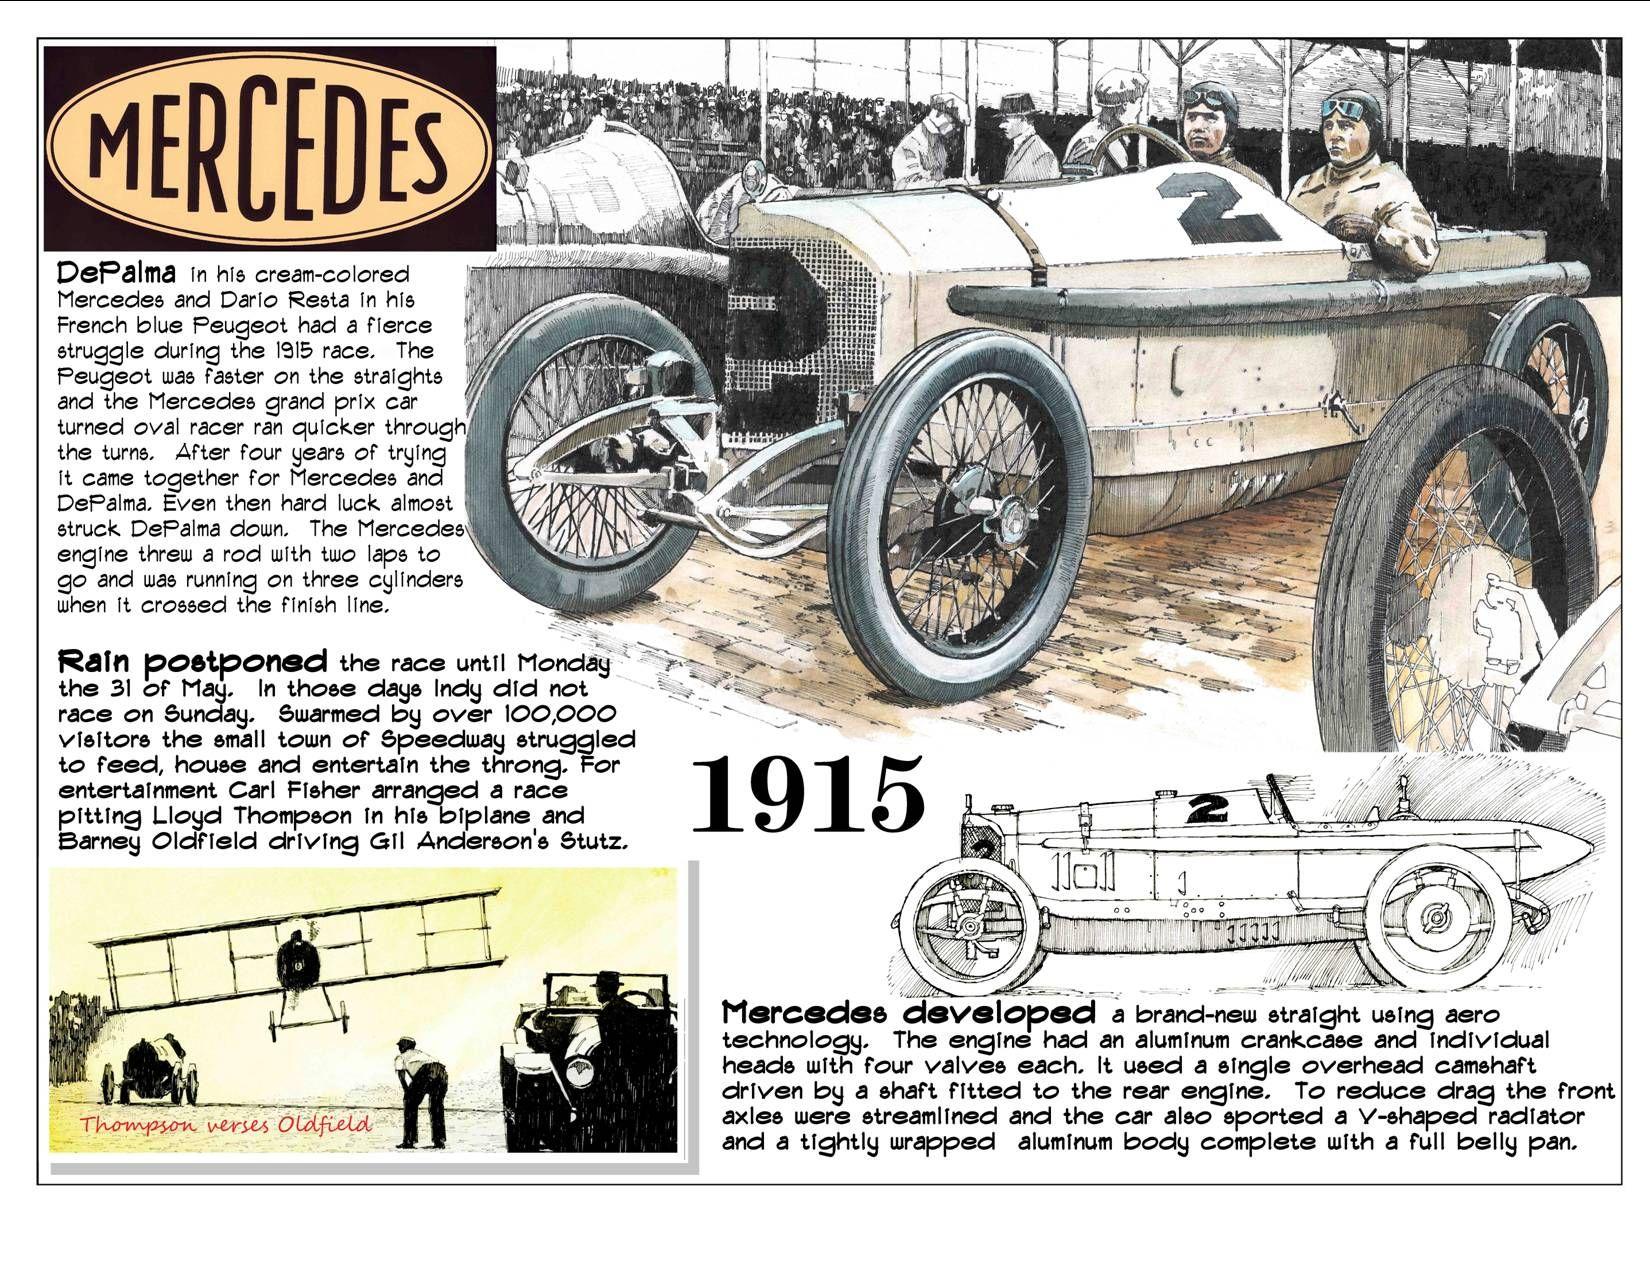 1915 indy 500 winner ralph depalma in the mercedes race car